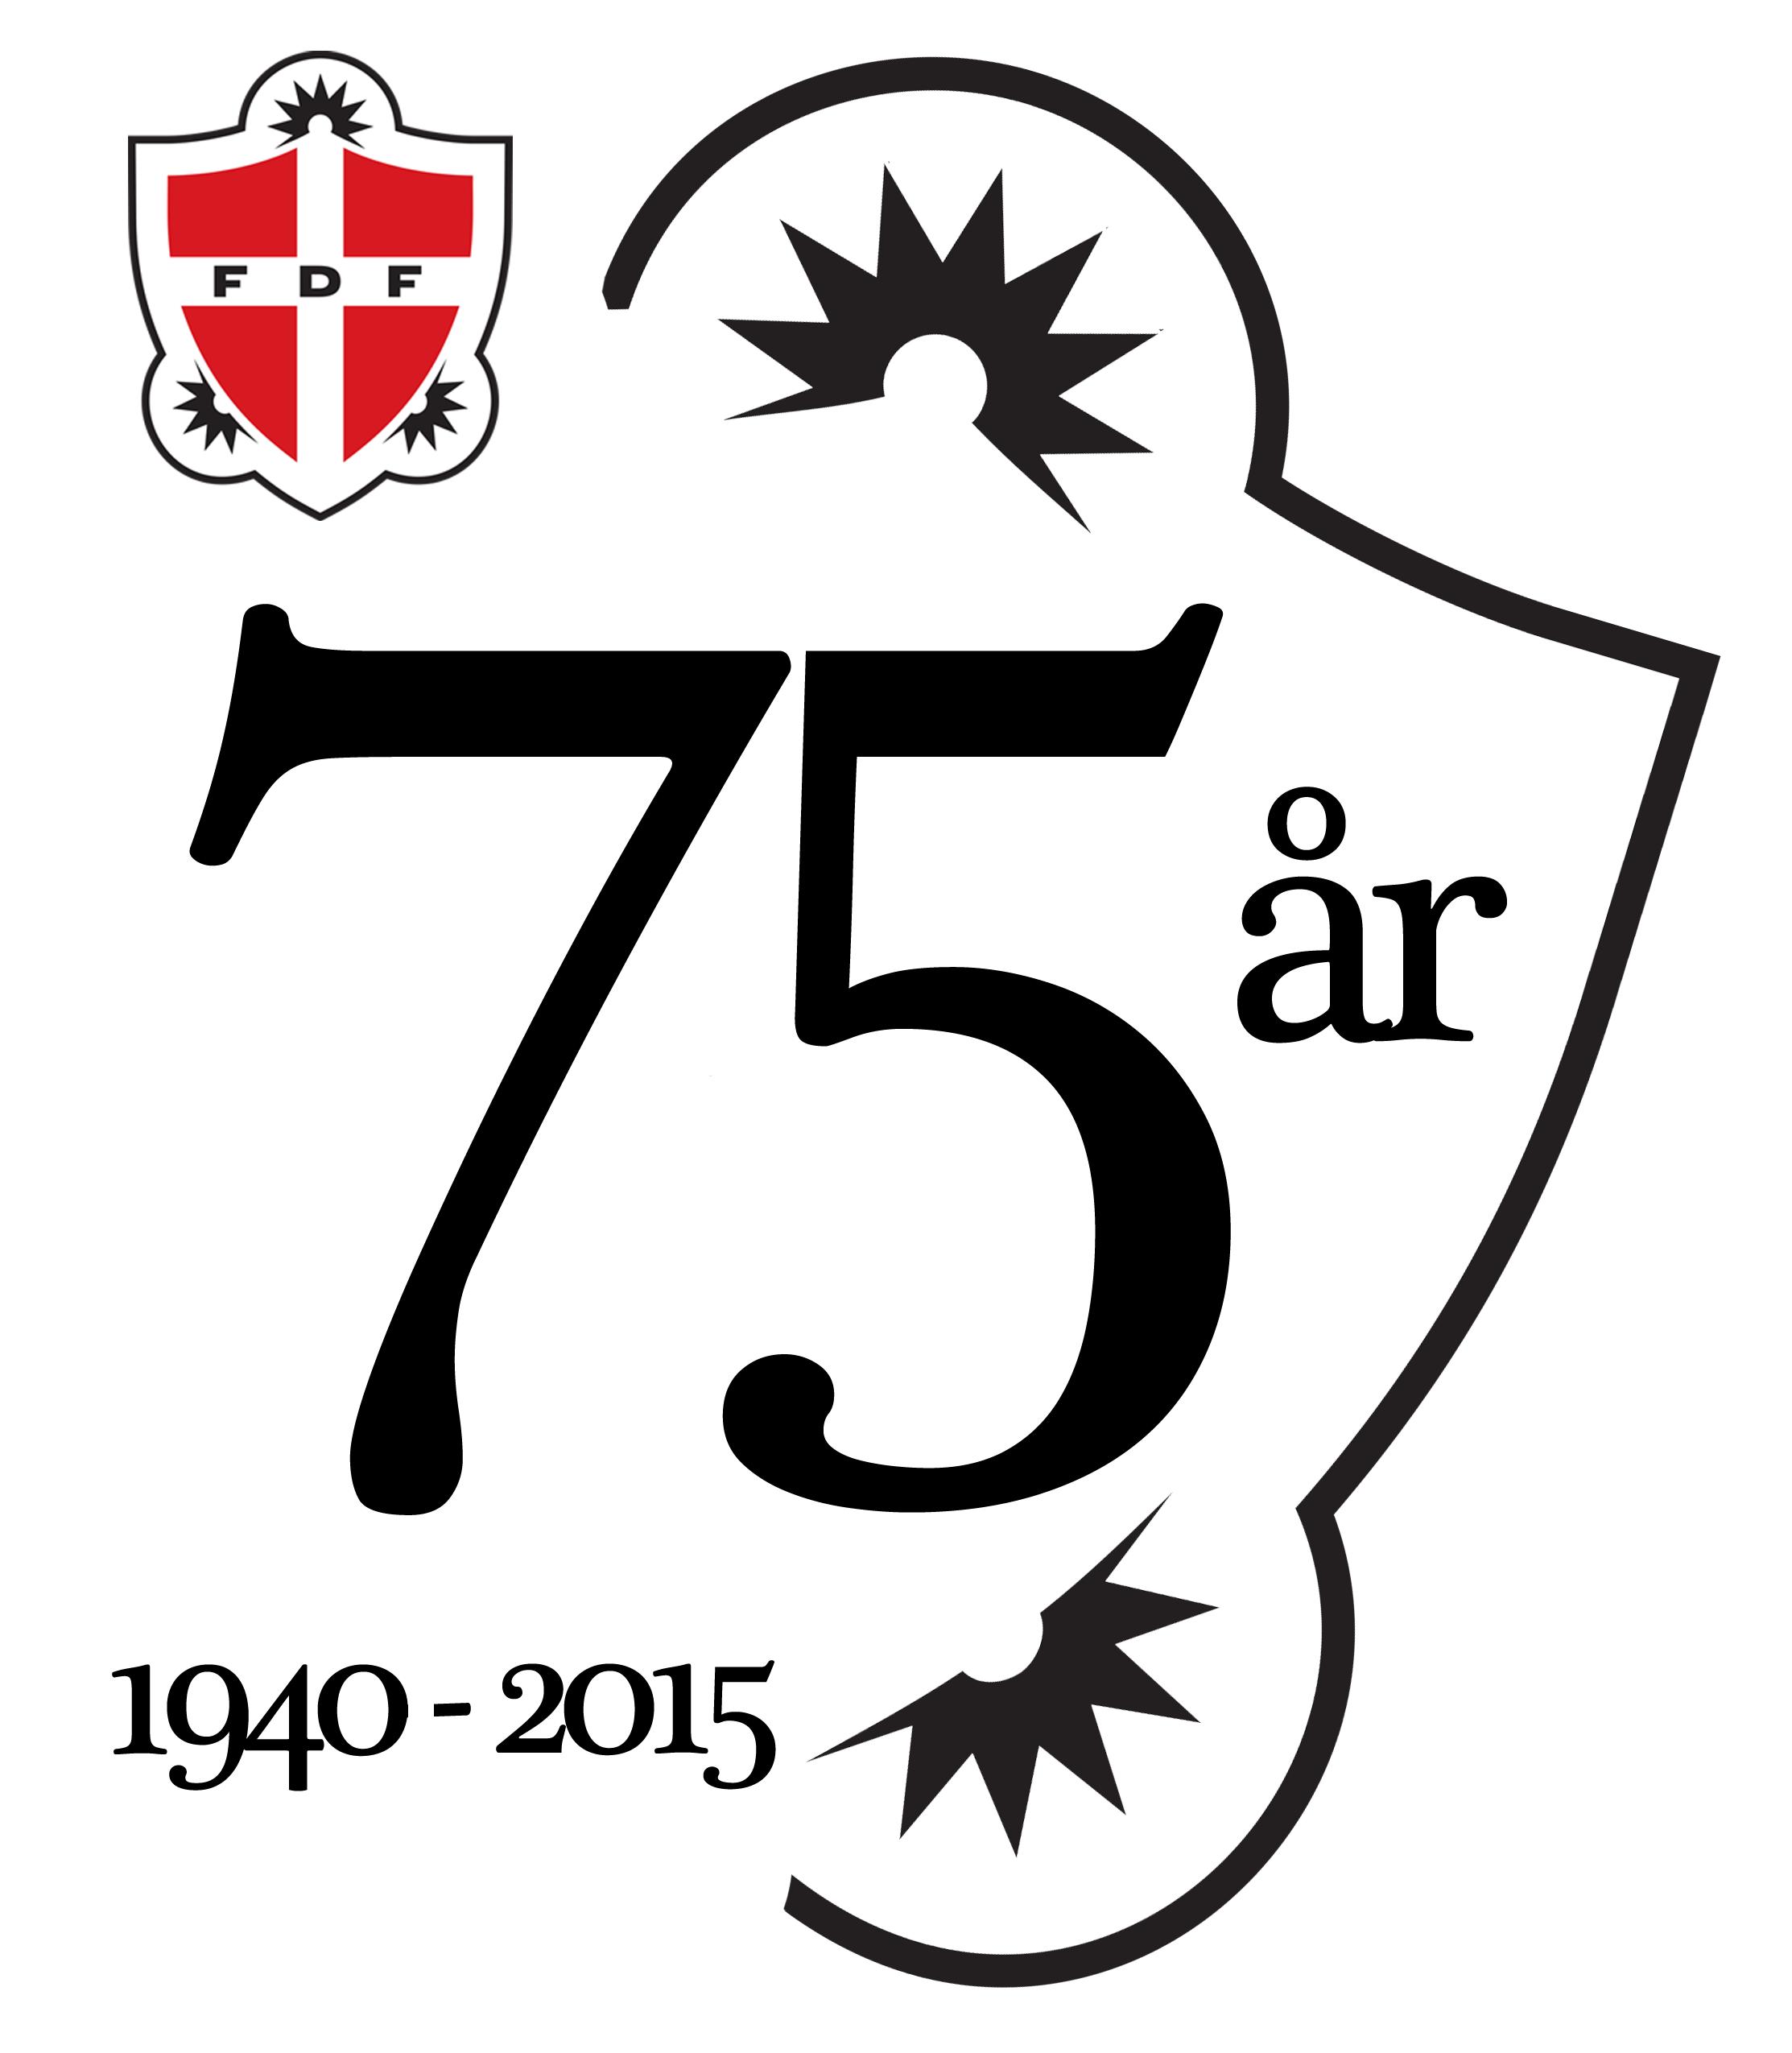 FDF 75 års jubilæum